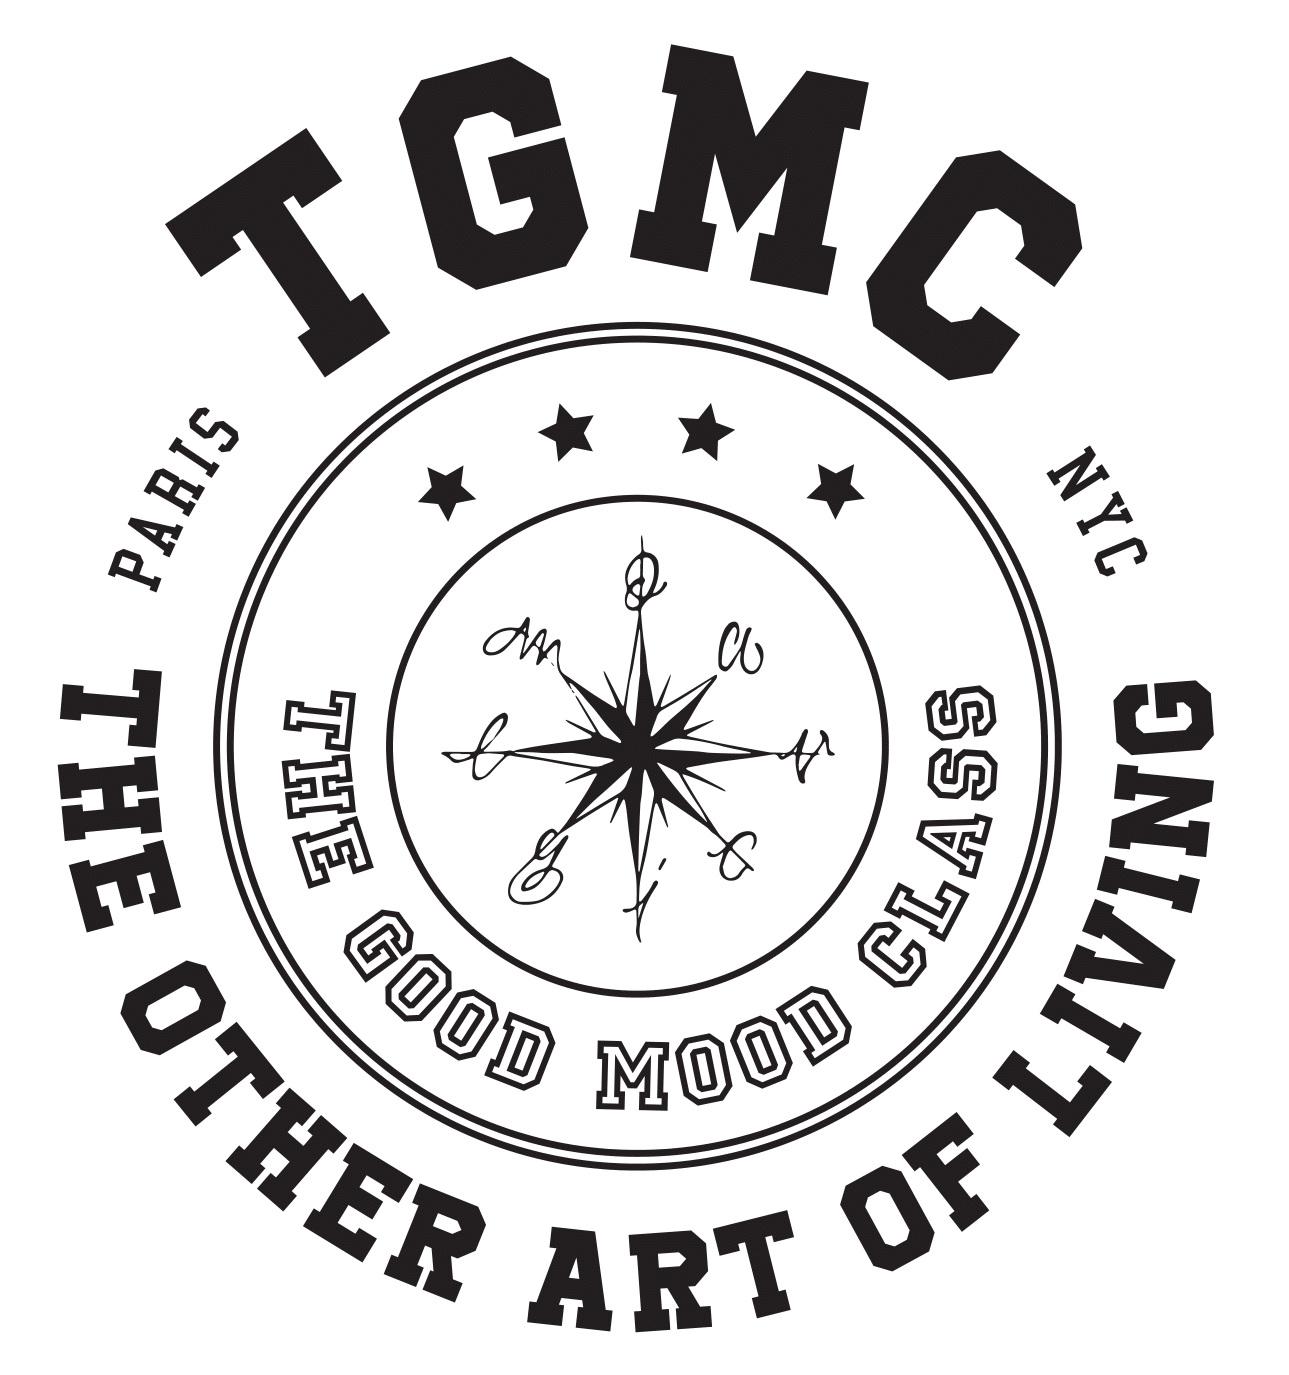 TGMC-PARIS-NYC-1-ConvertImage.jpg